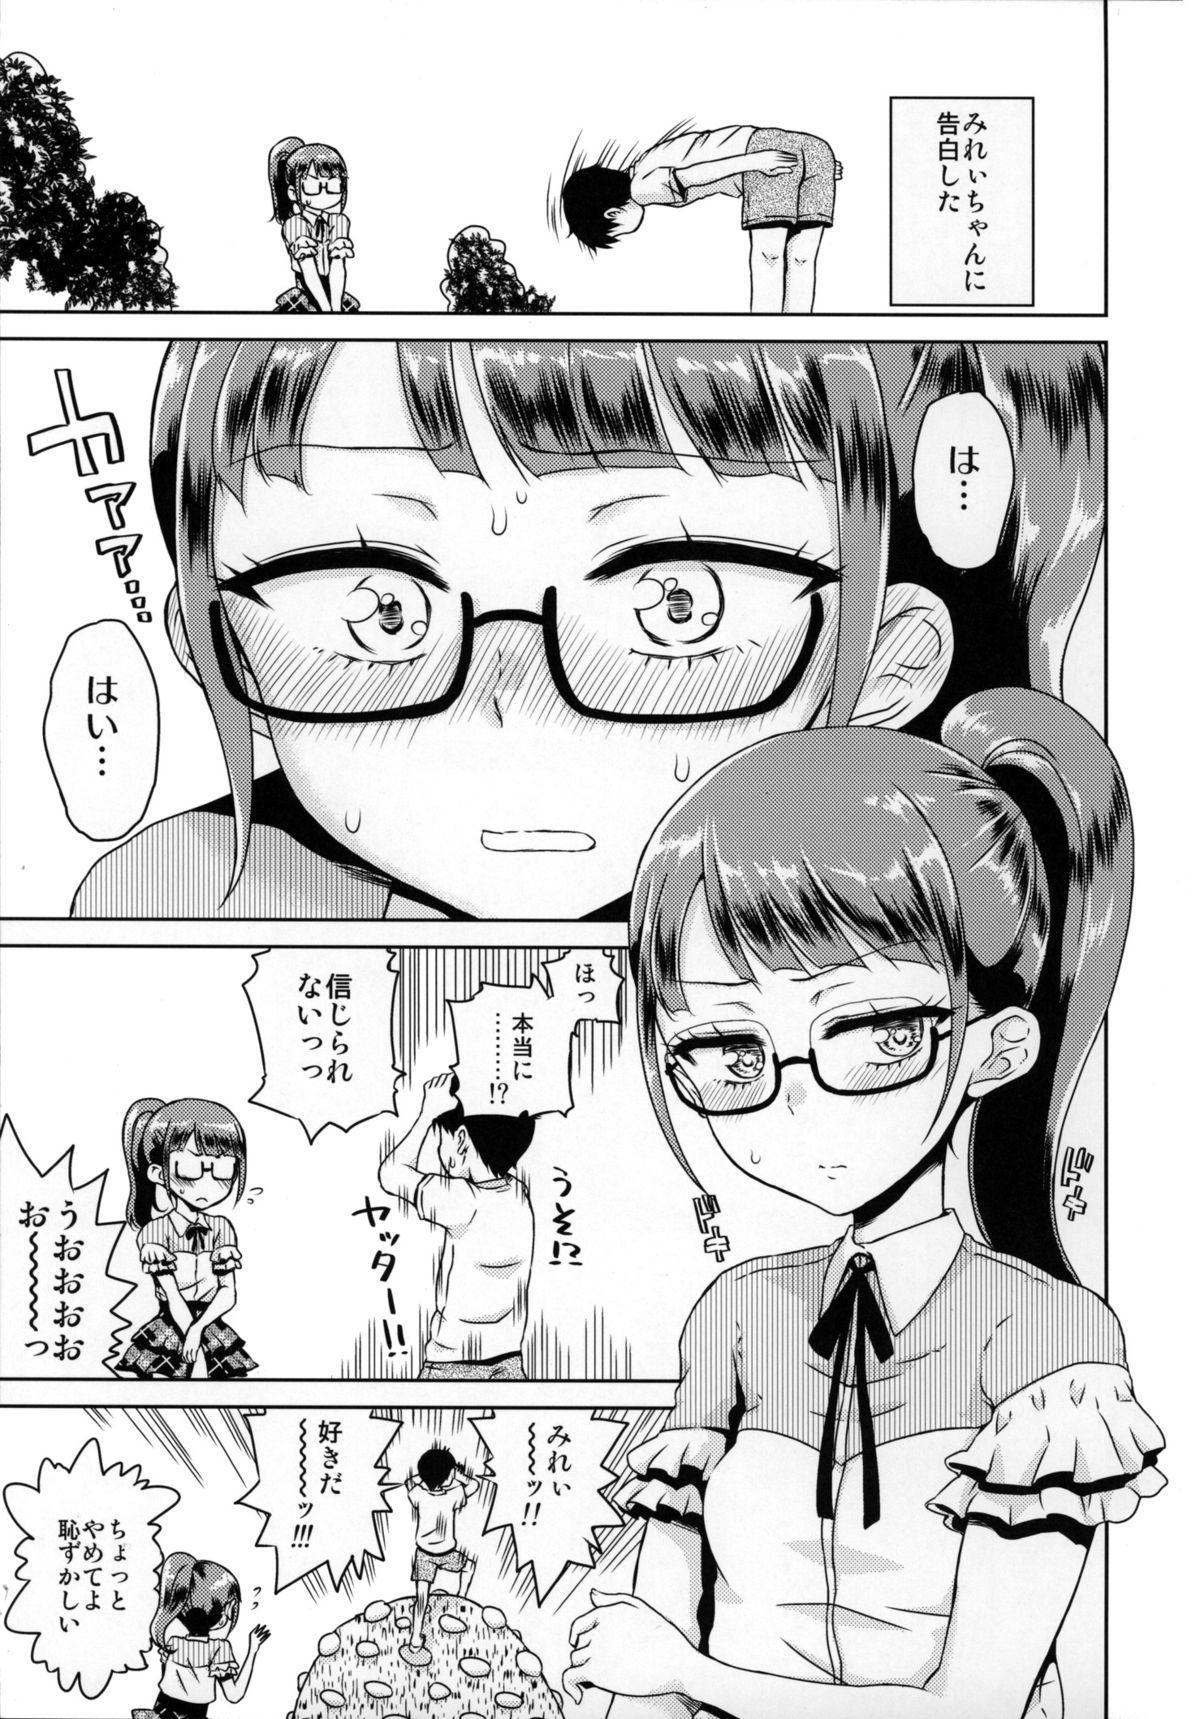 Mirei-chan to Love Love 1